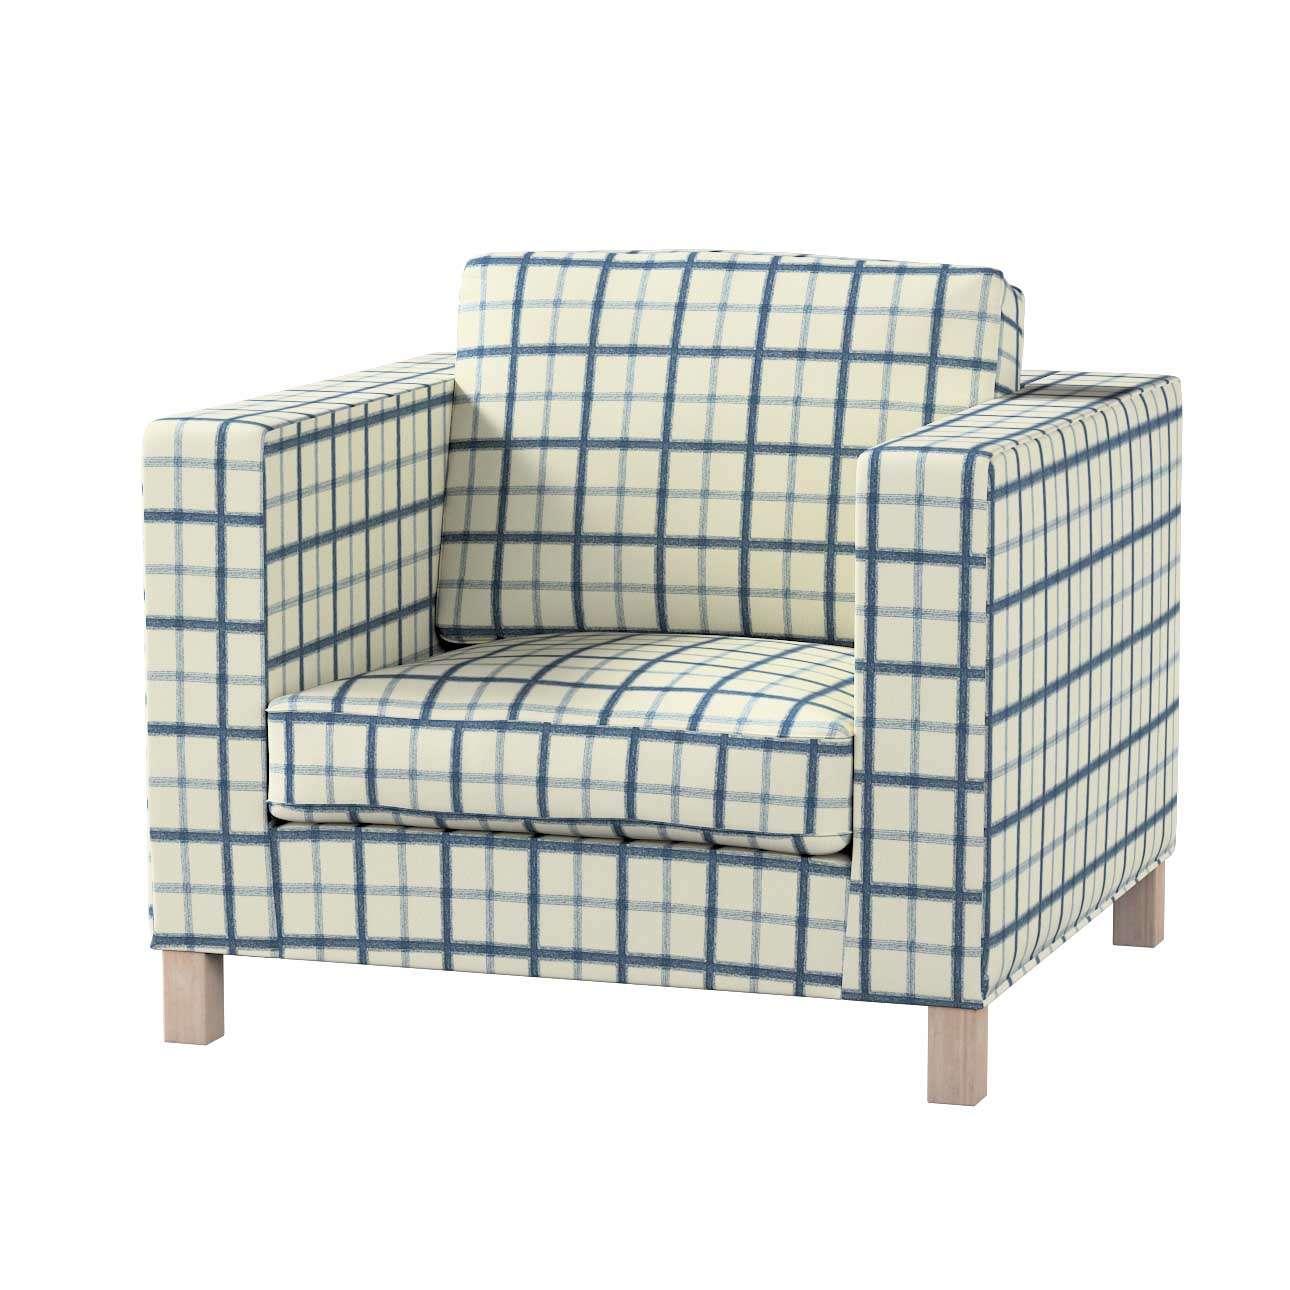 Pokrowiec na fotel Karlanda, krótki fotel Karlanda w kolekcji Avinon, tkanina: 131-66